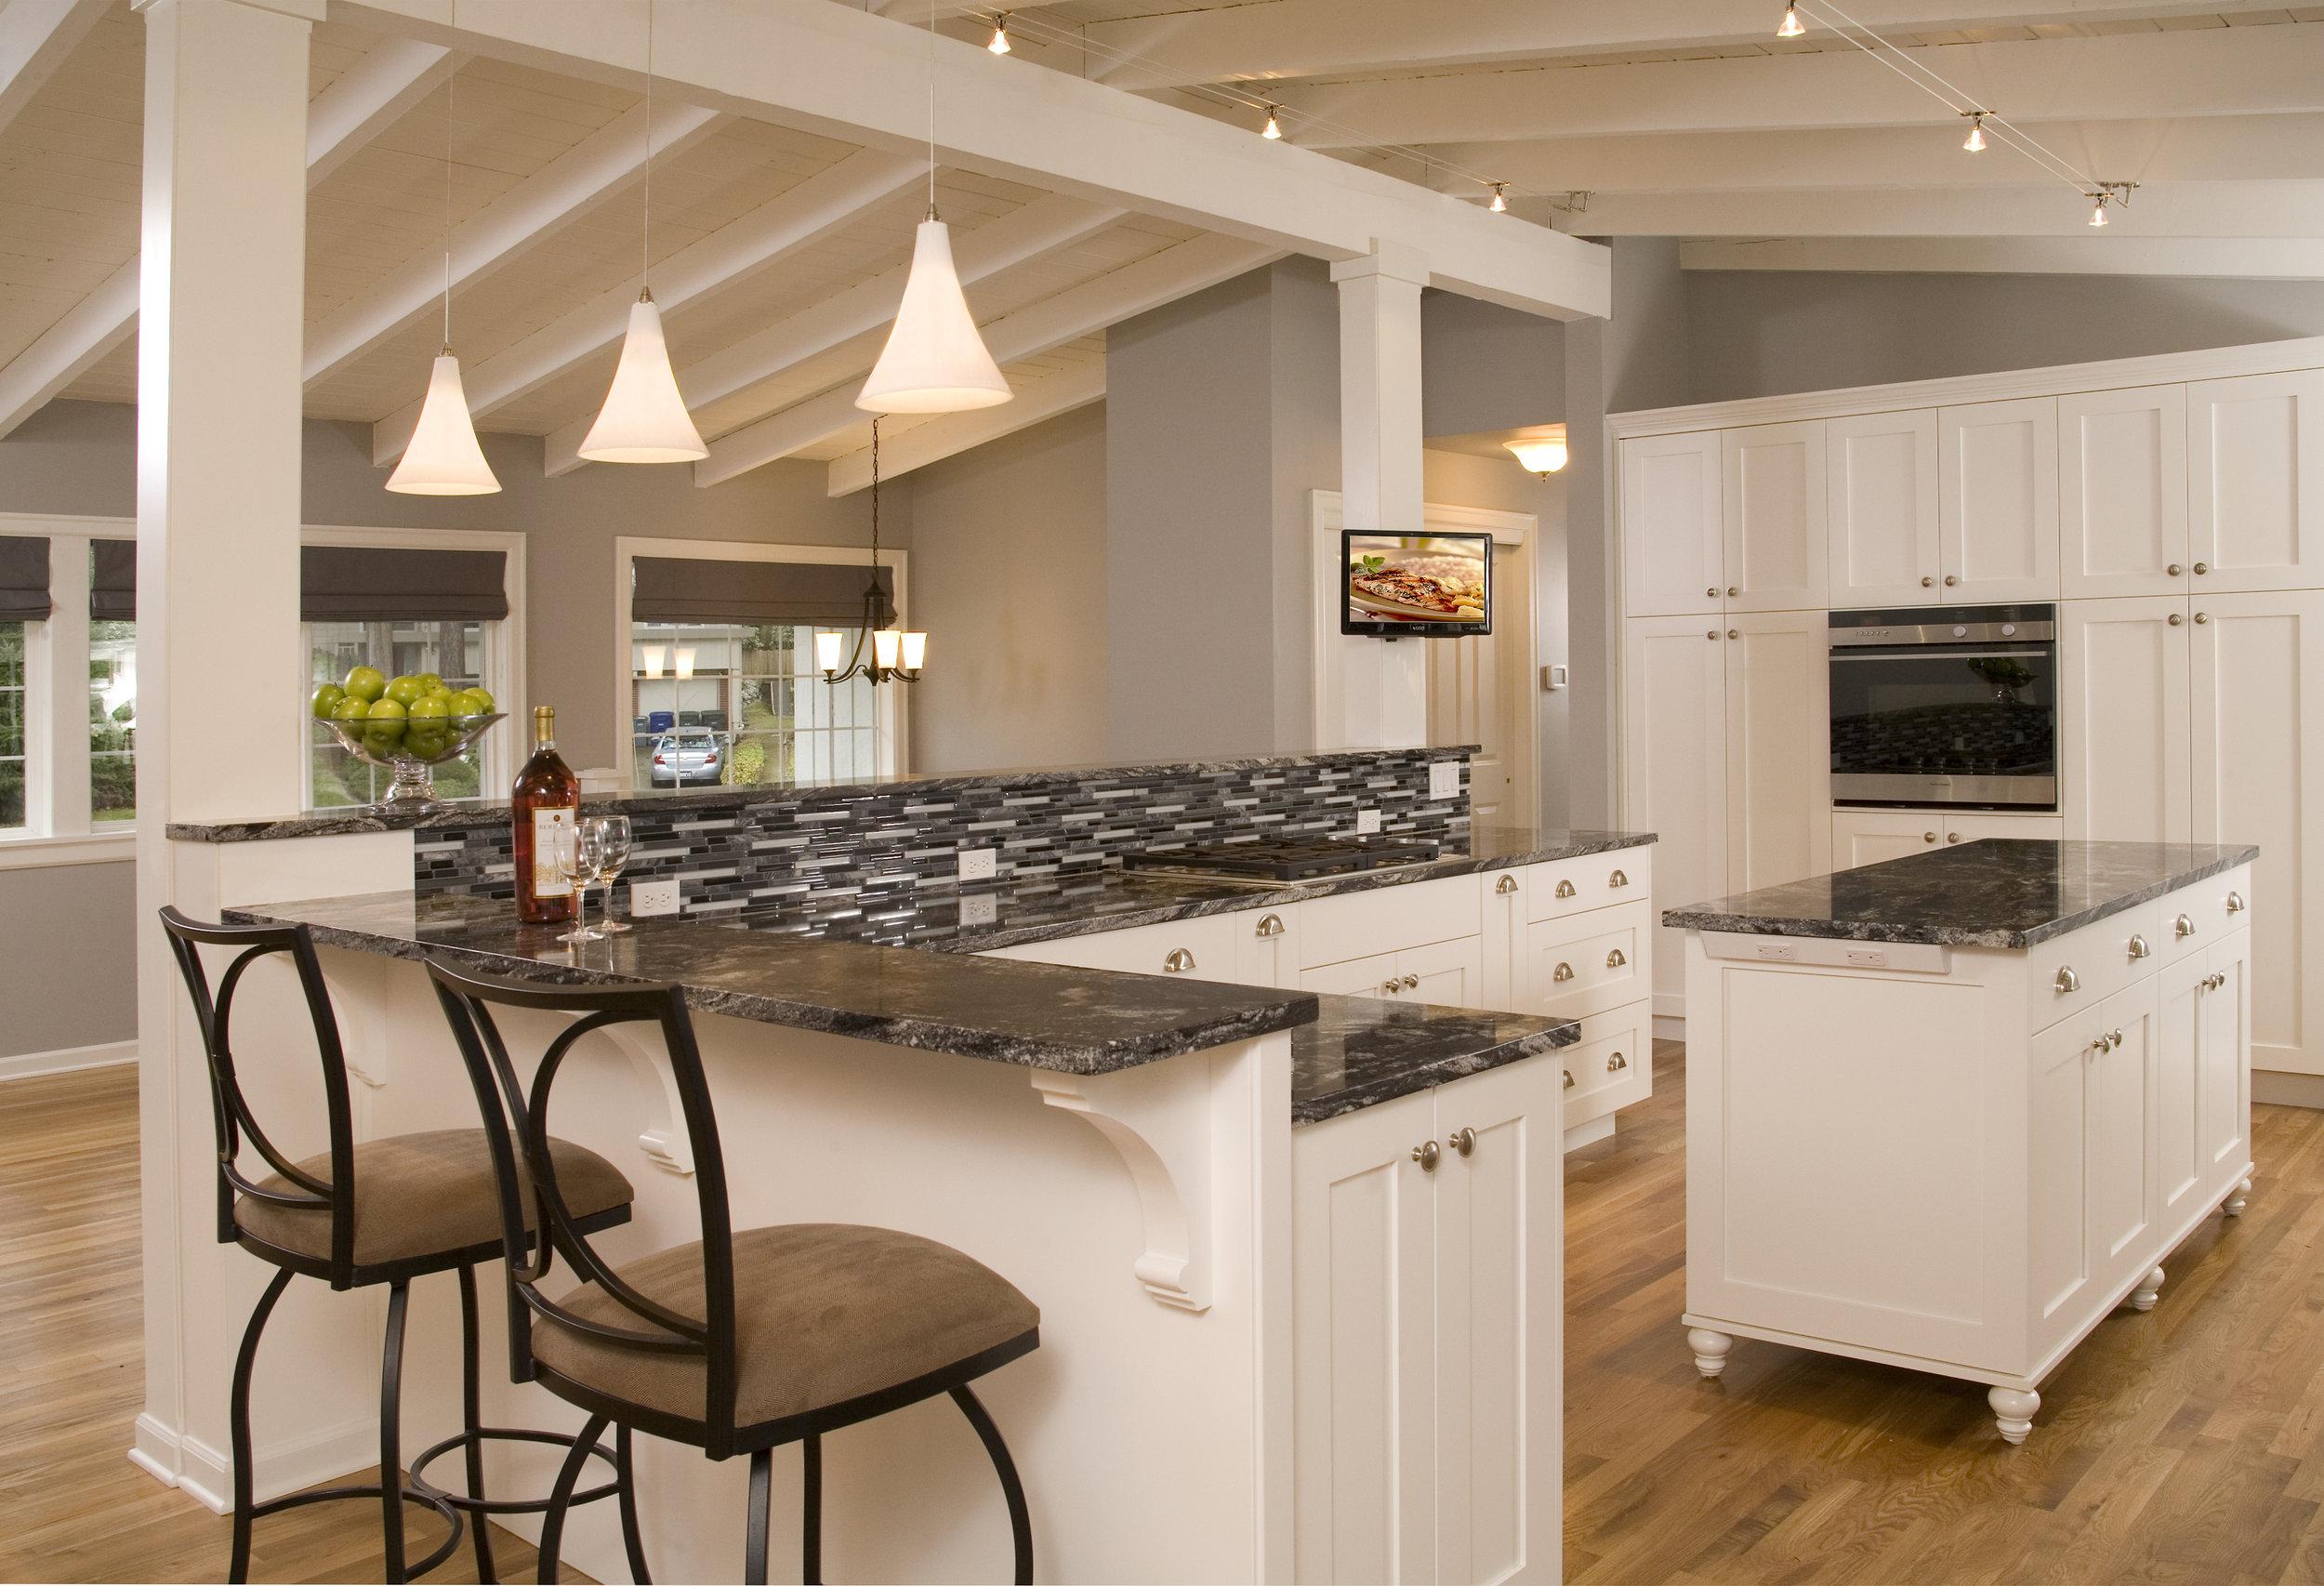 Bellevue Newport Hills Transitional Kitchen 2.jpg